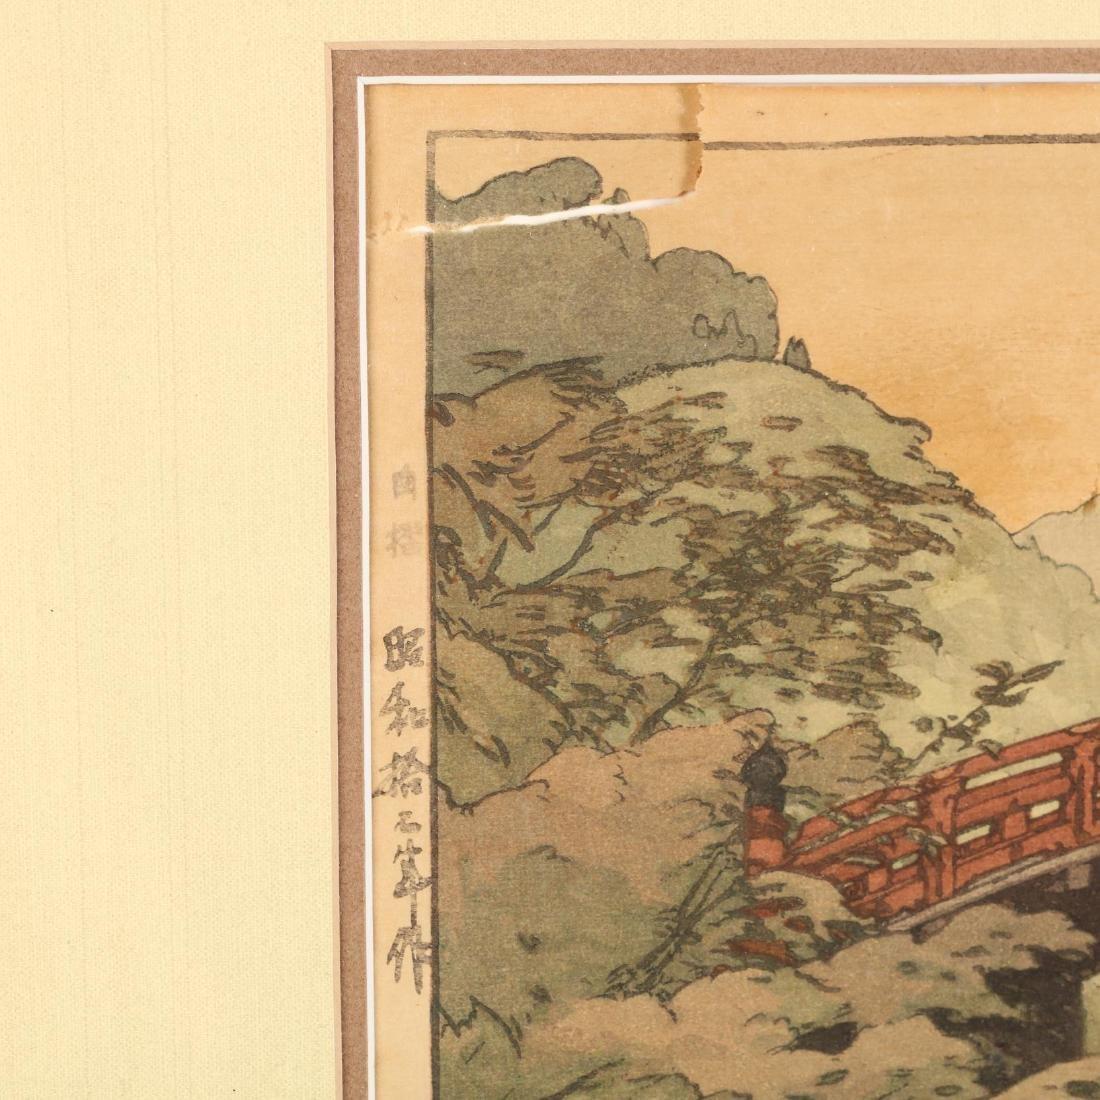 Three Japanese Woodblock Prints by Hiroshi Yoshida - 4